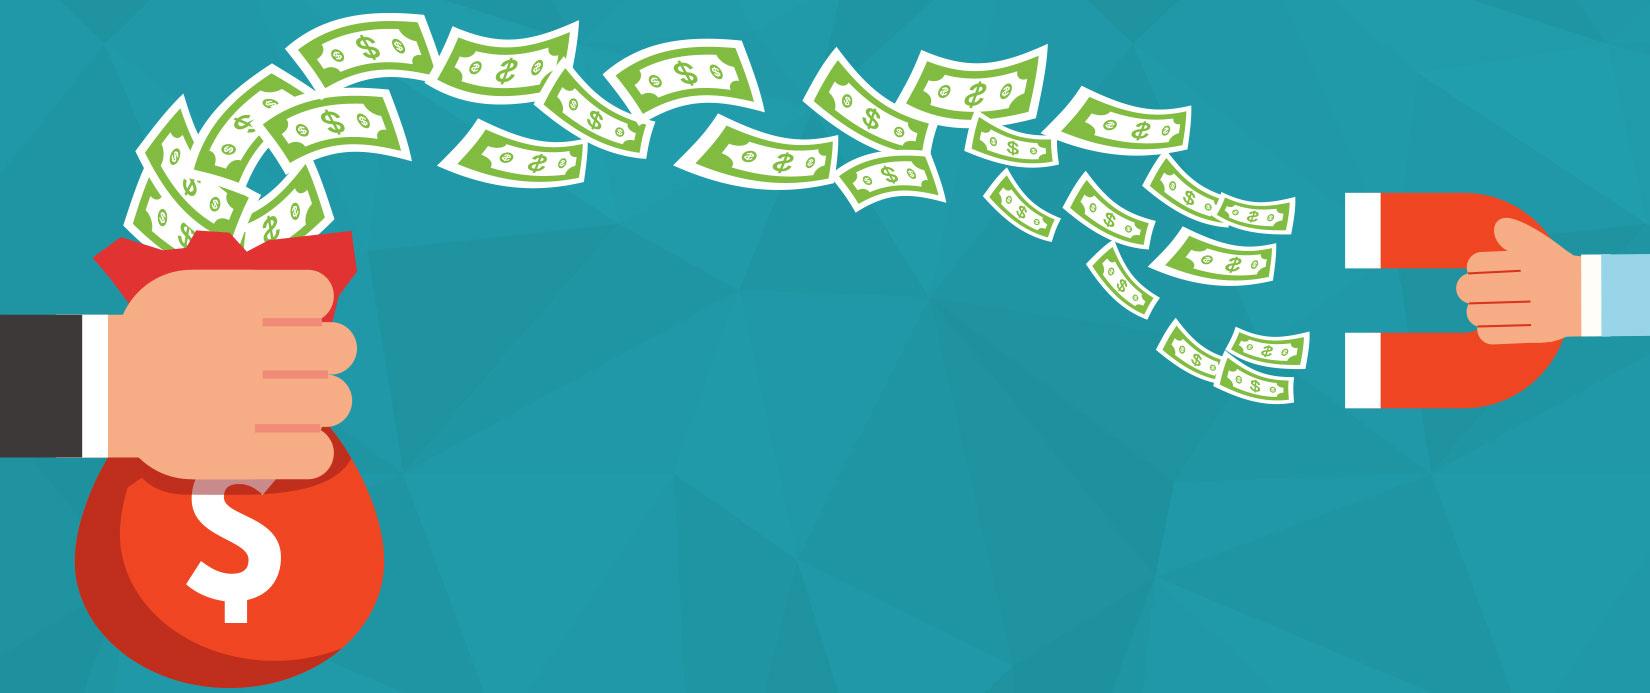 Pramata_Revenue-Assurance-blog-images.jpg